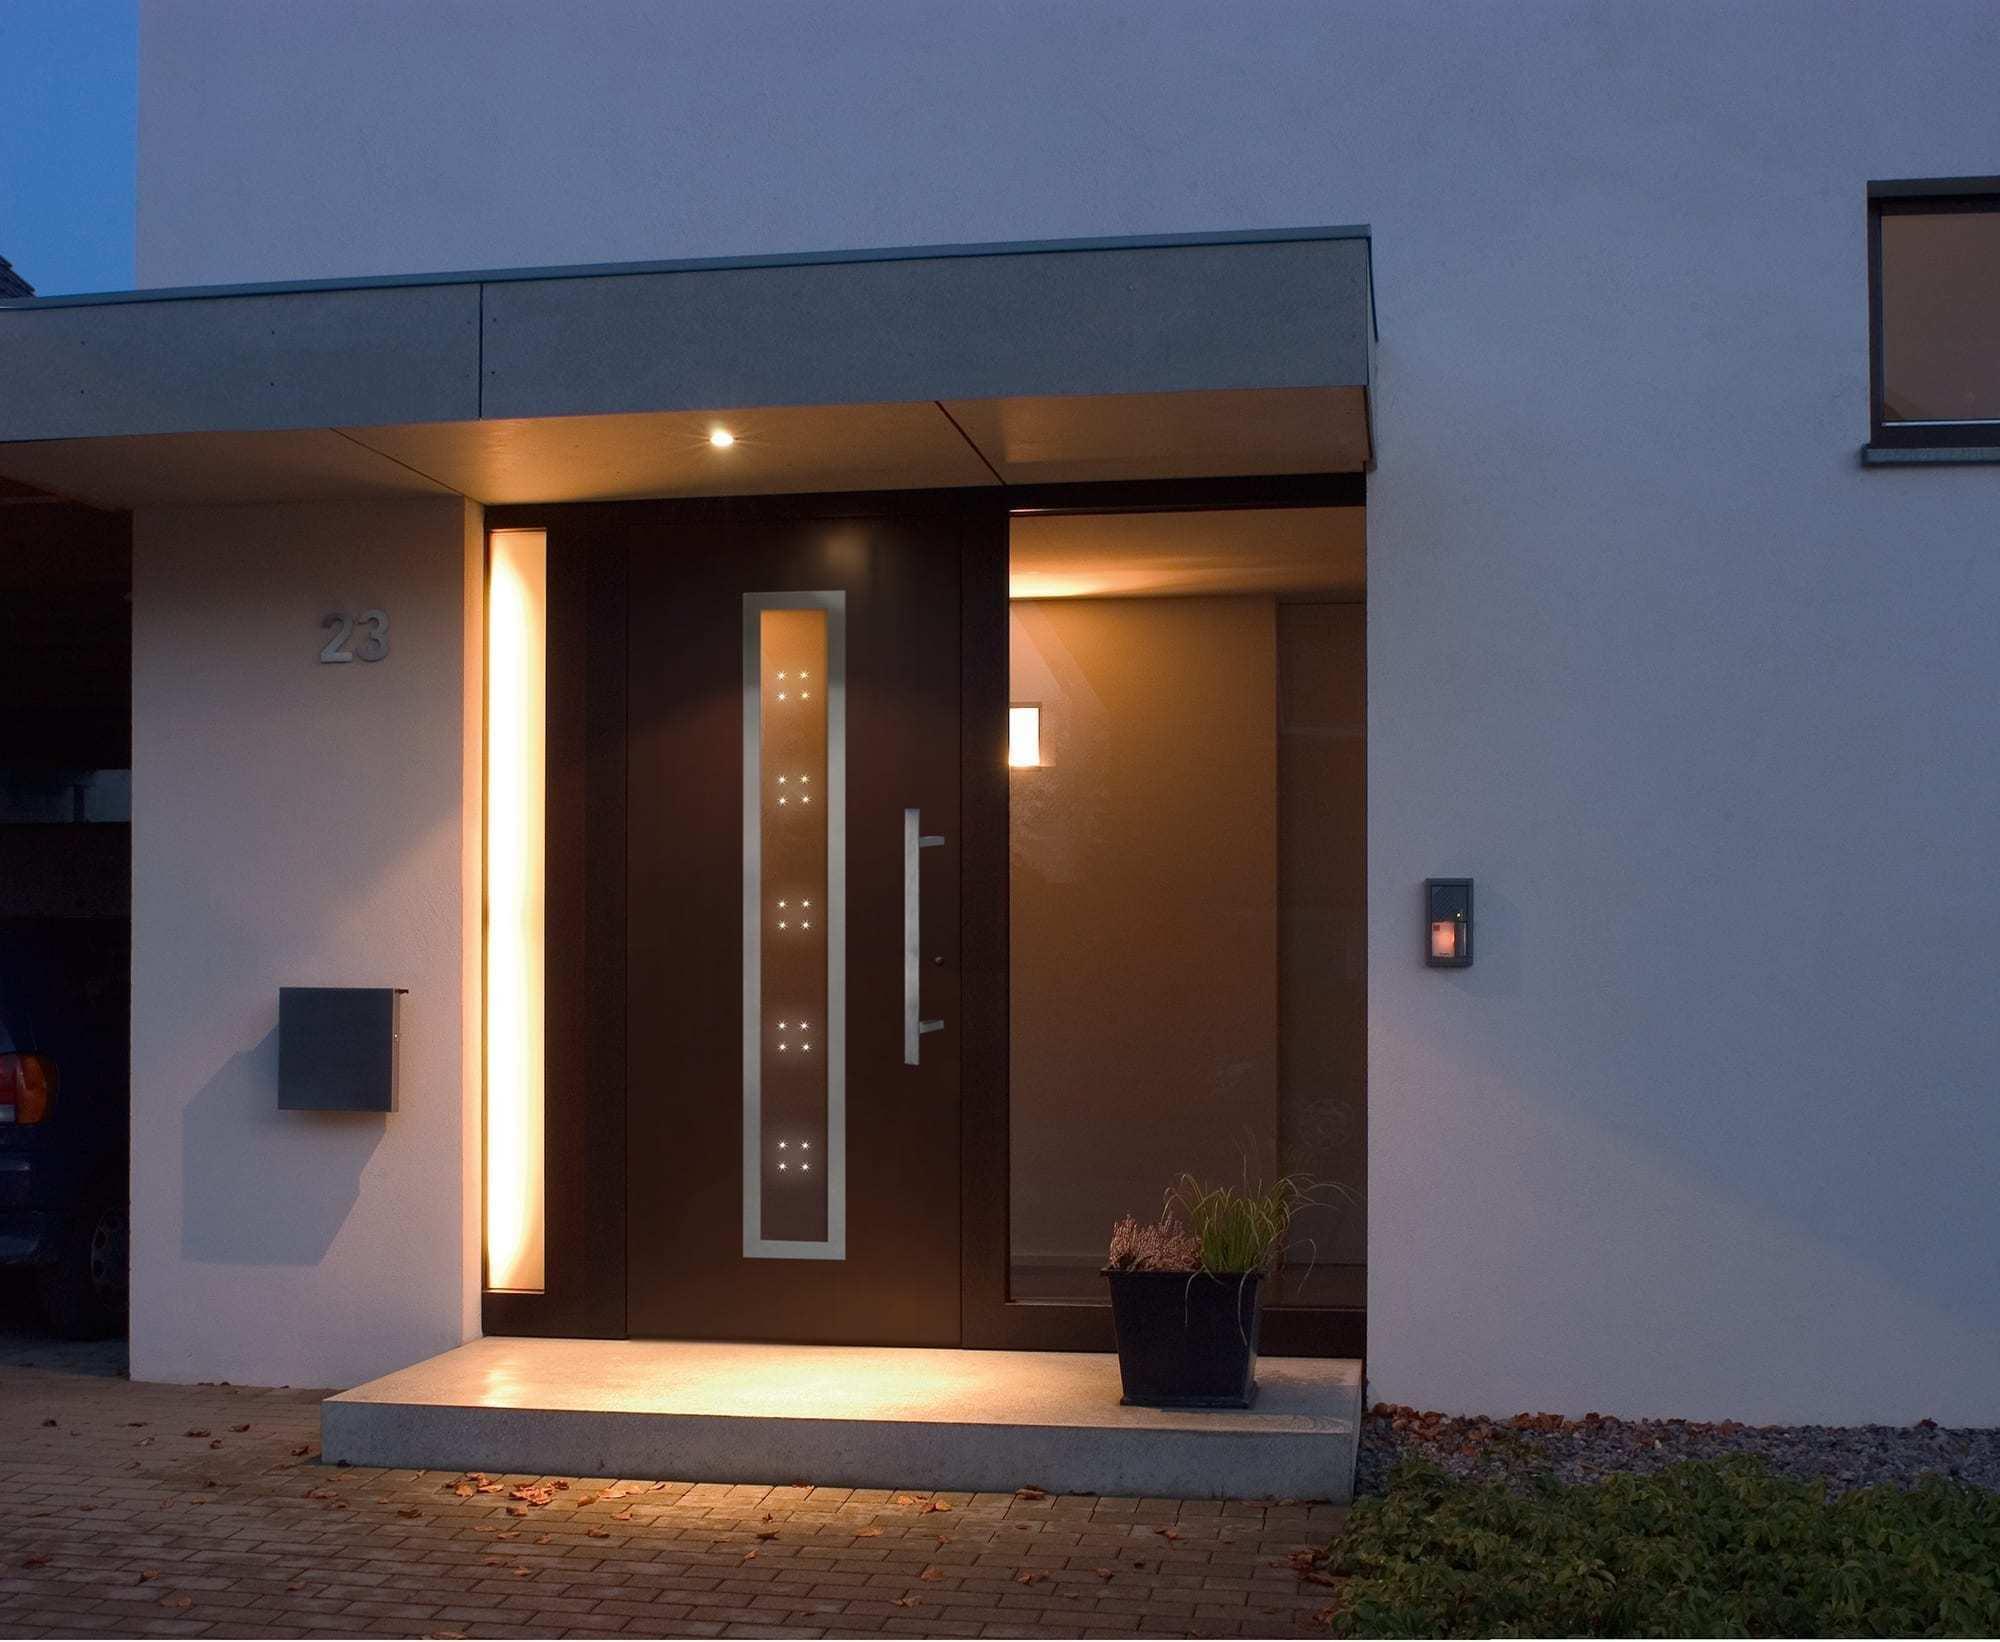 au ergew hnliche haust r beleuchtung au en yp79 kyushucon. Black Bedroom Furniture Sets. Home Design Ideas